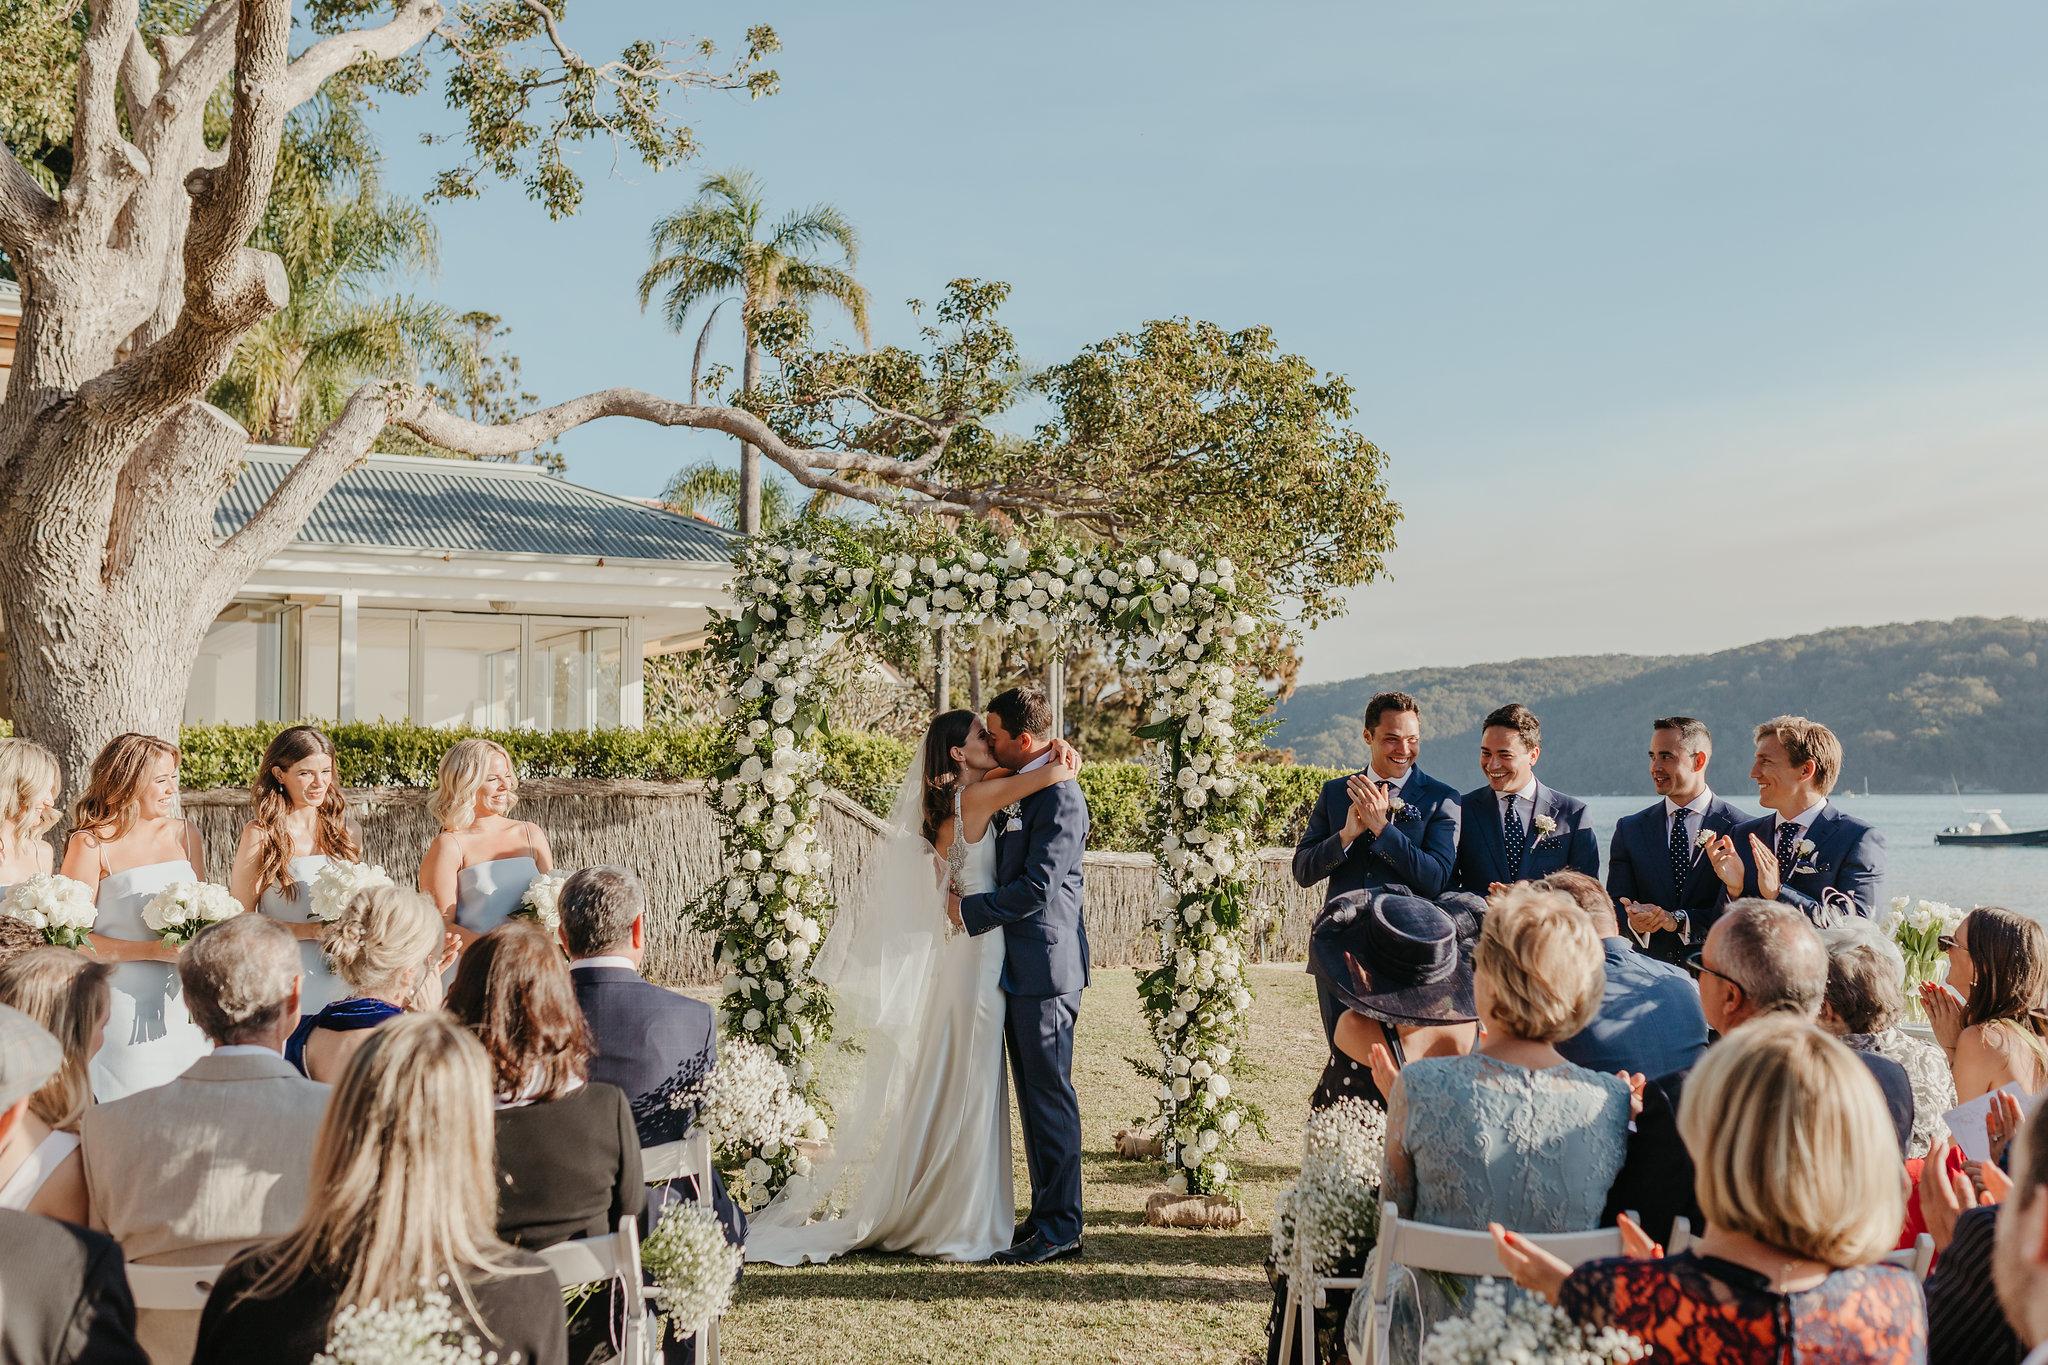 gen_chris_story_of_us_wedding-0338.JPG